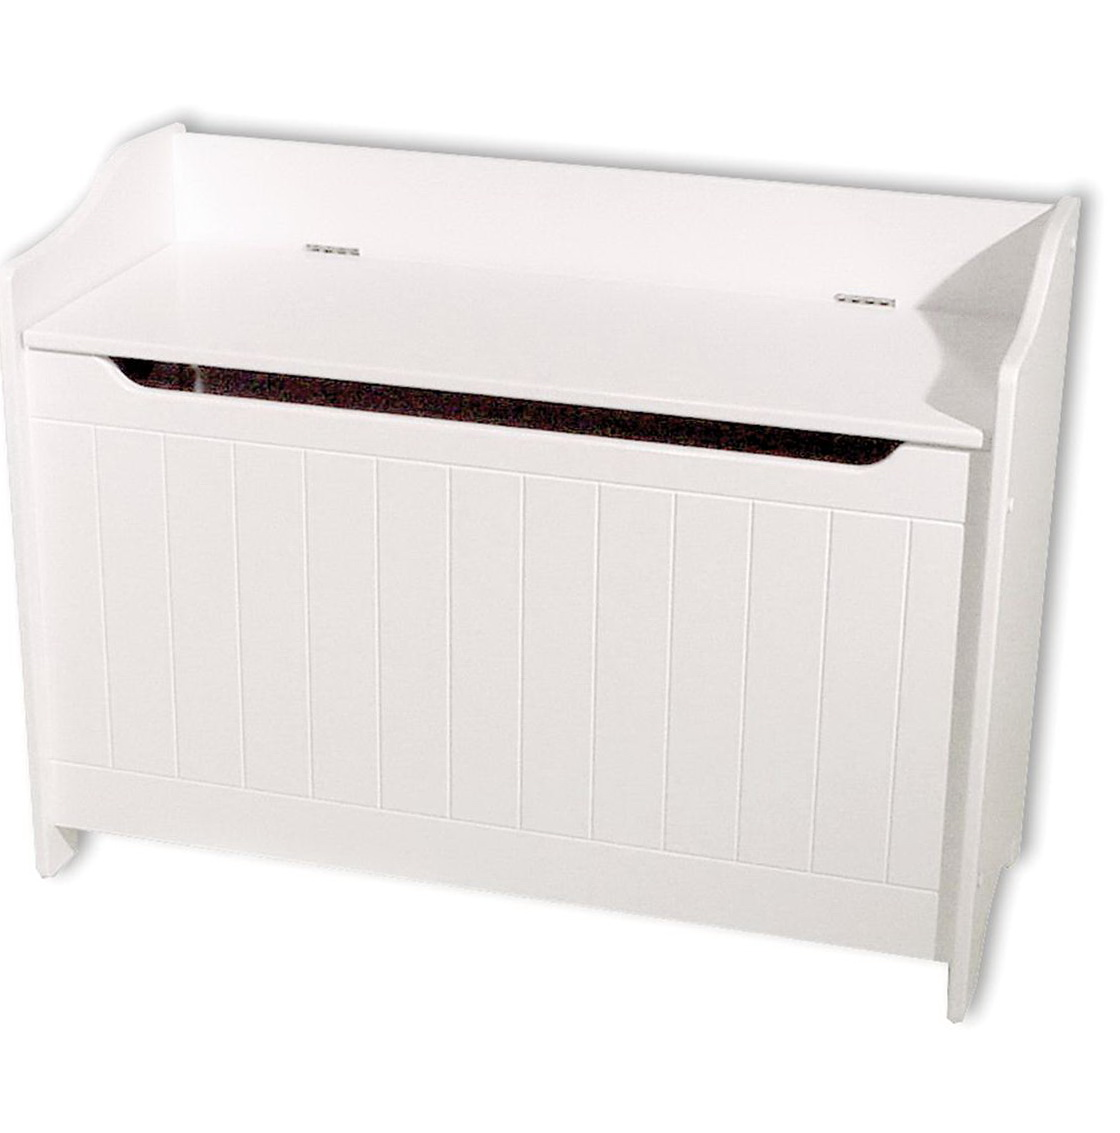 White Toy Chest Bench